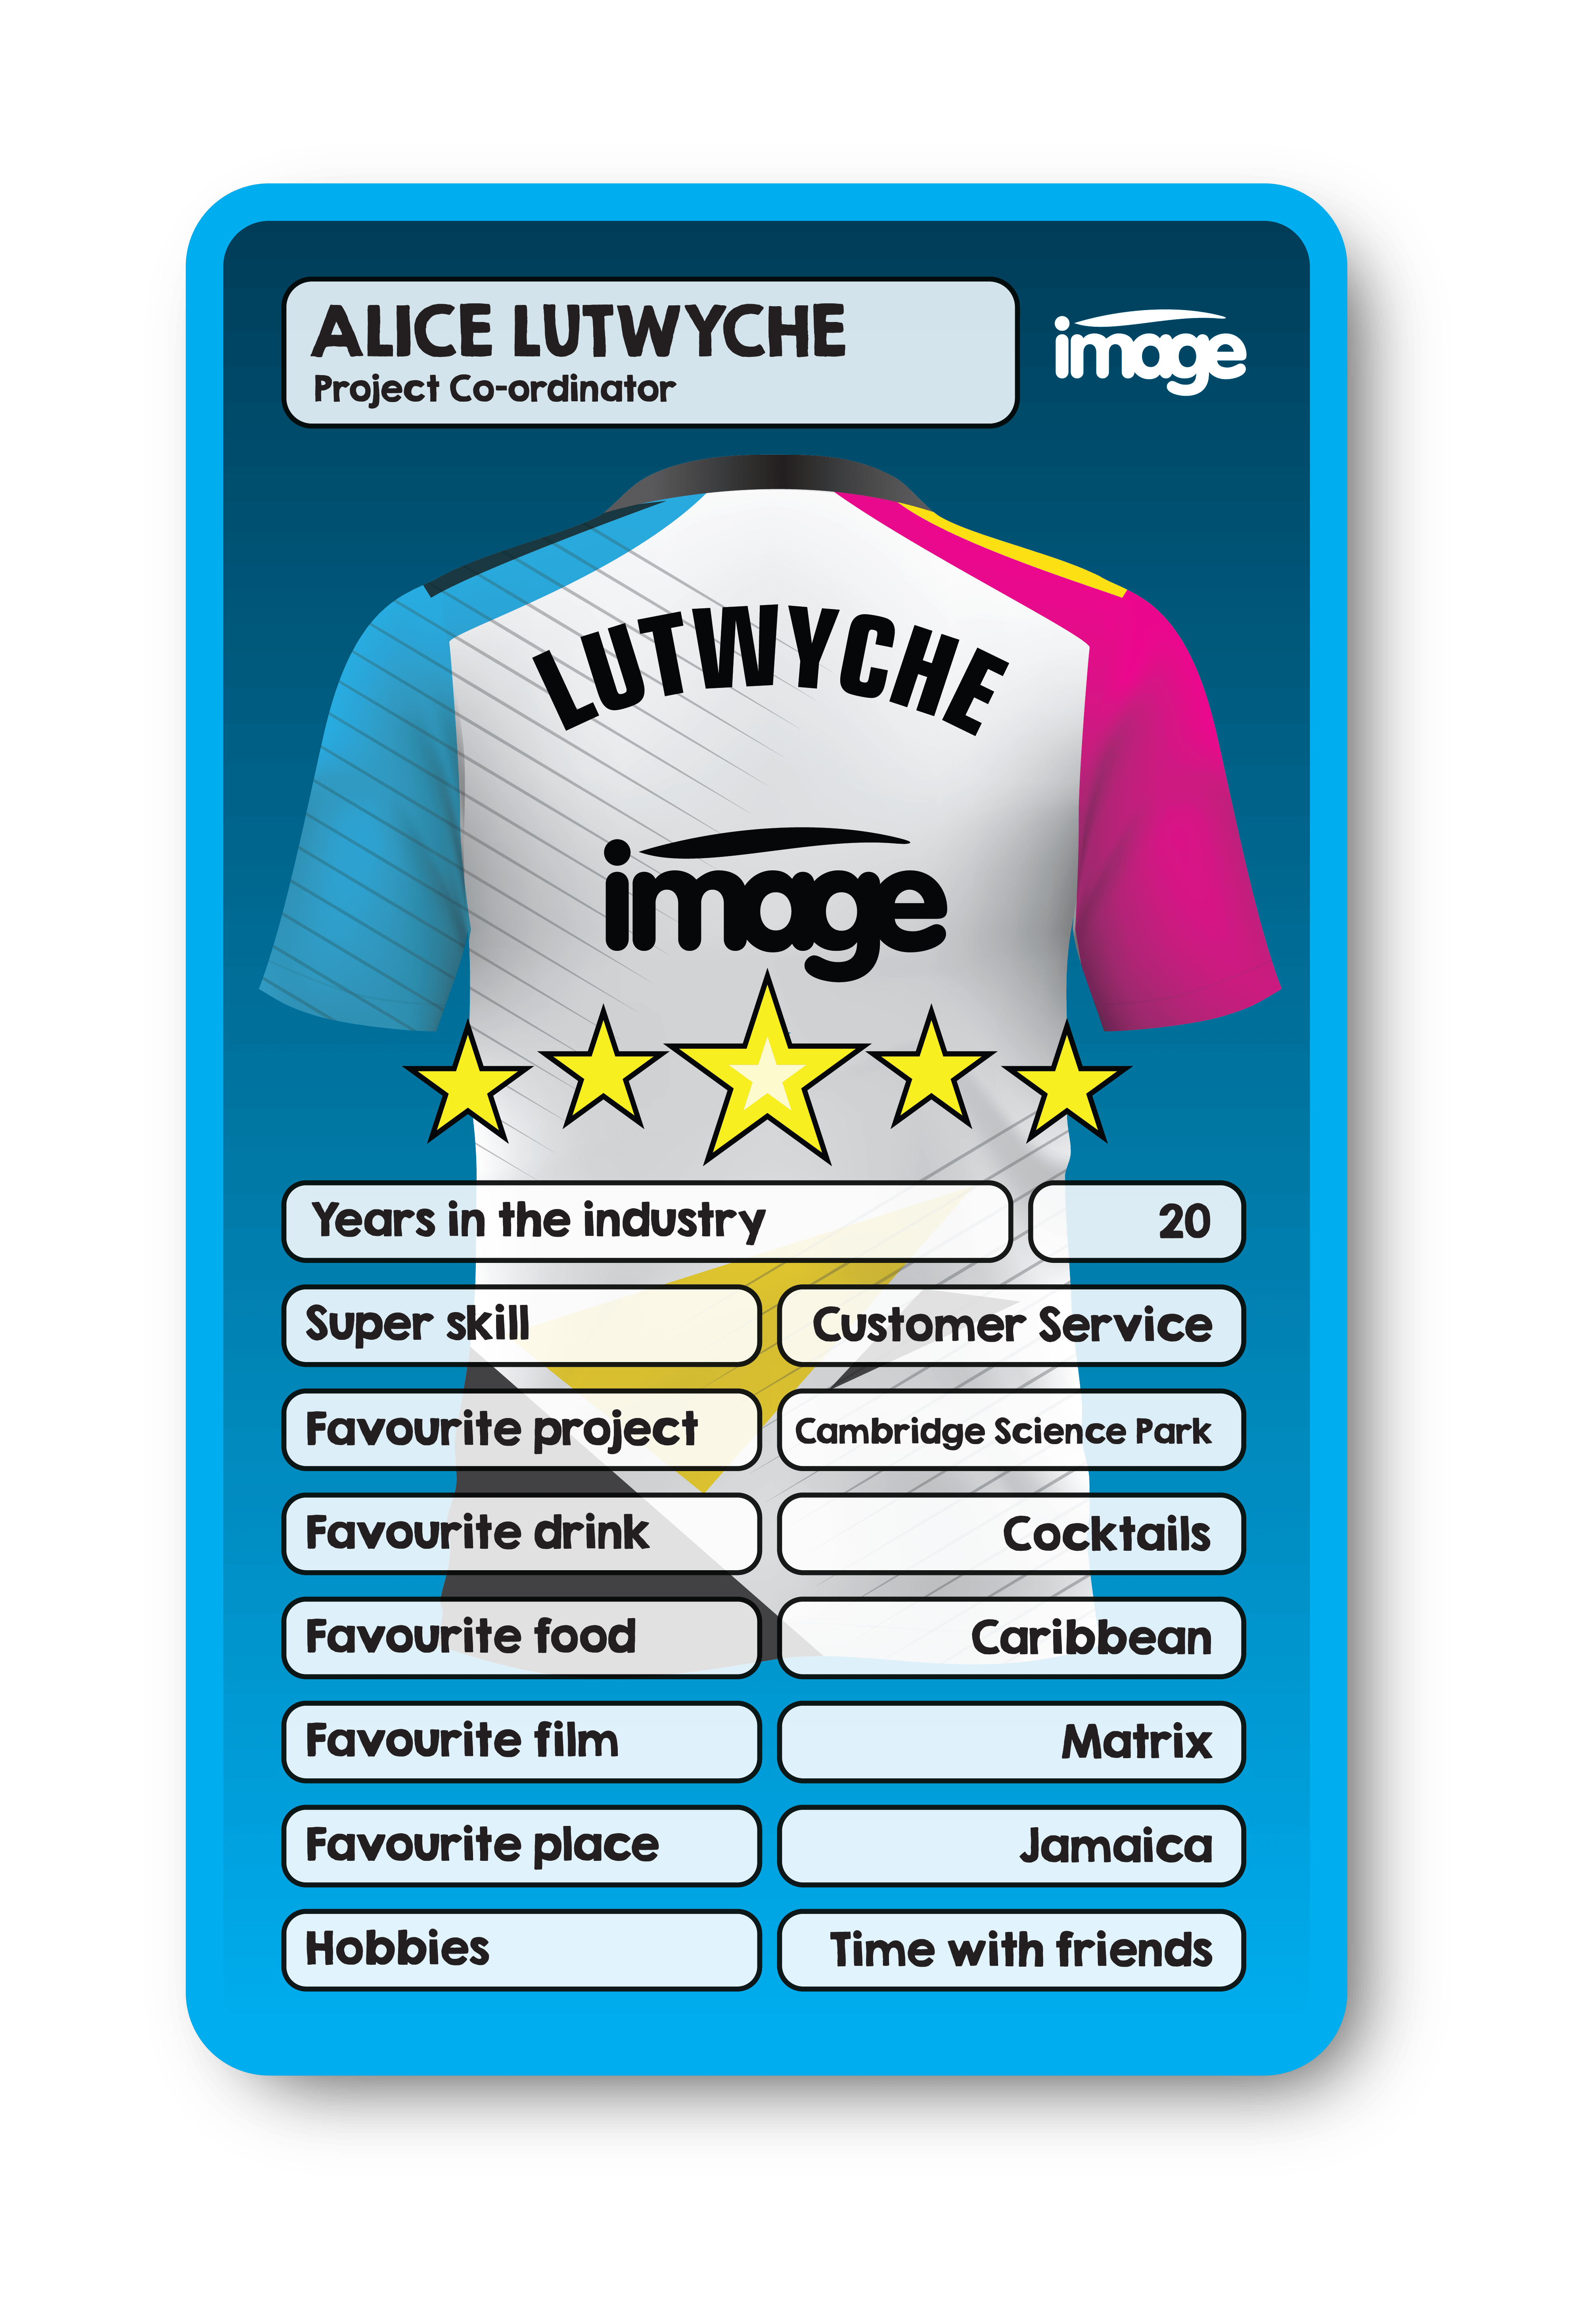 Card 10-1